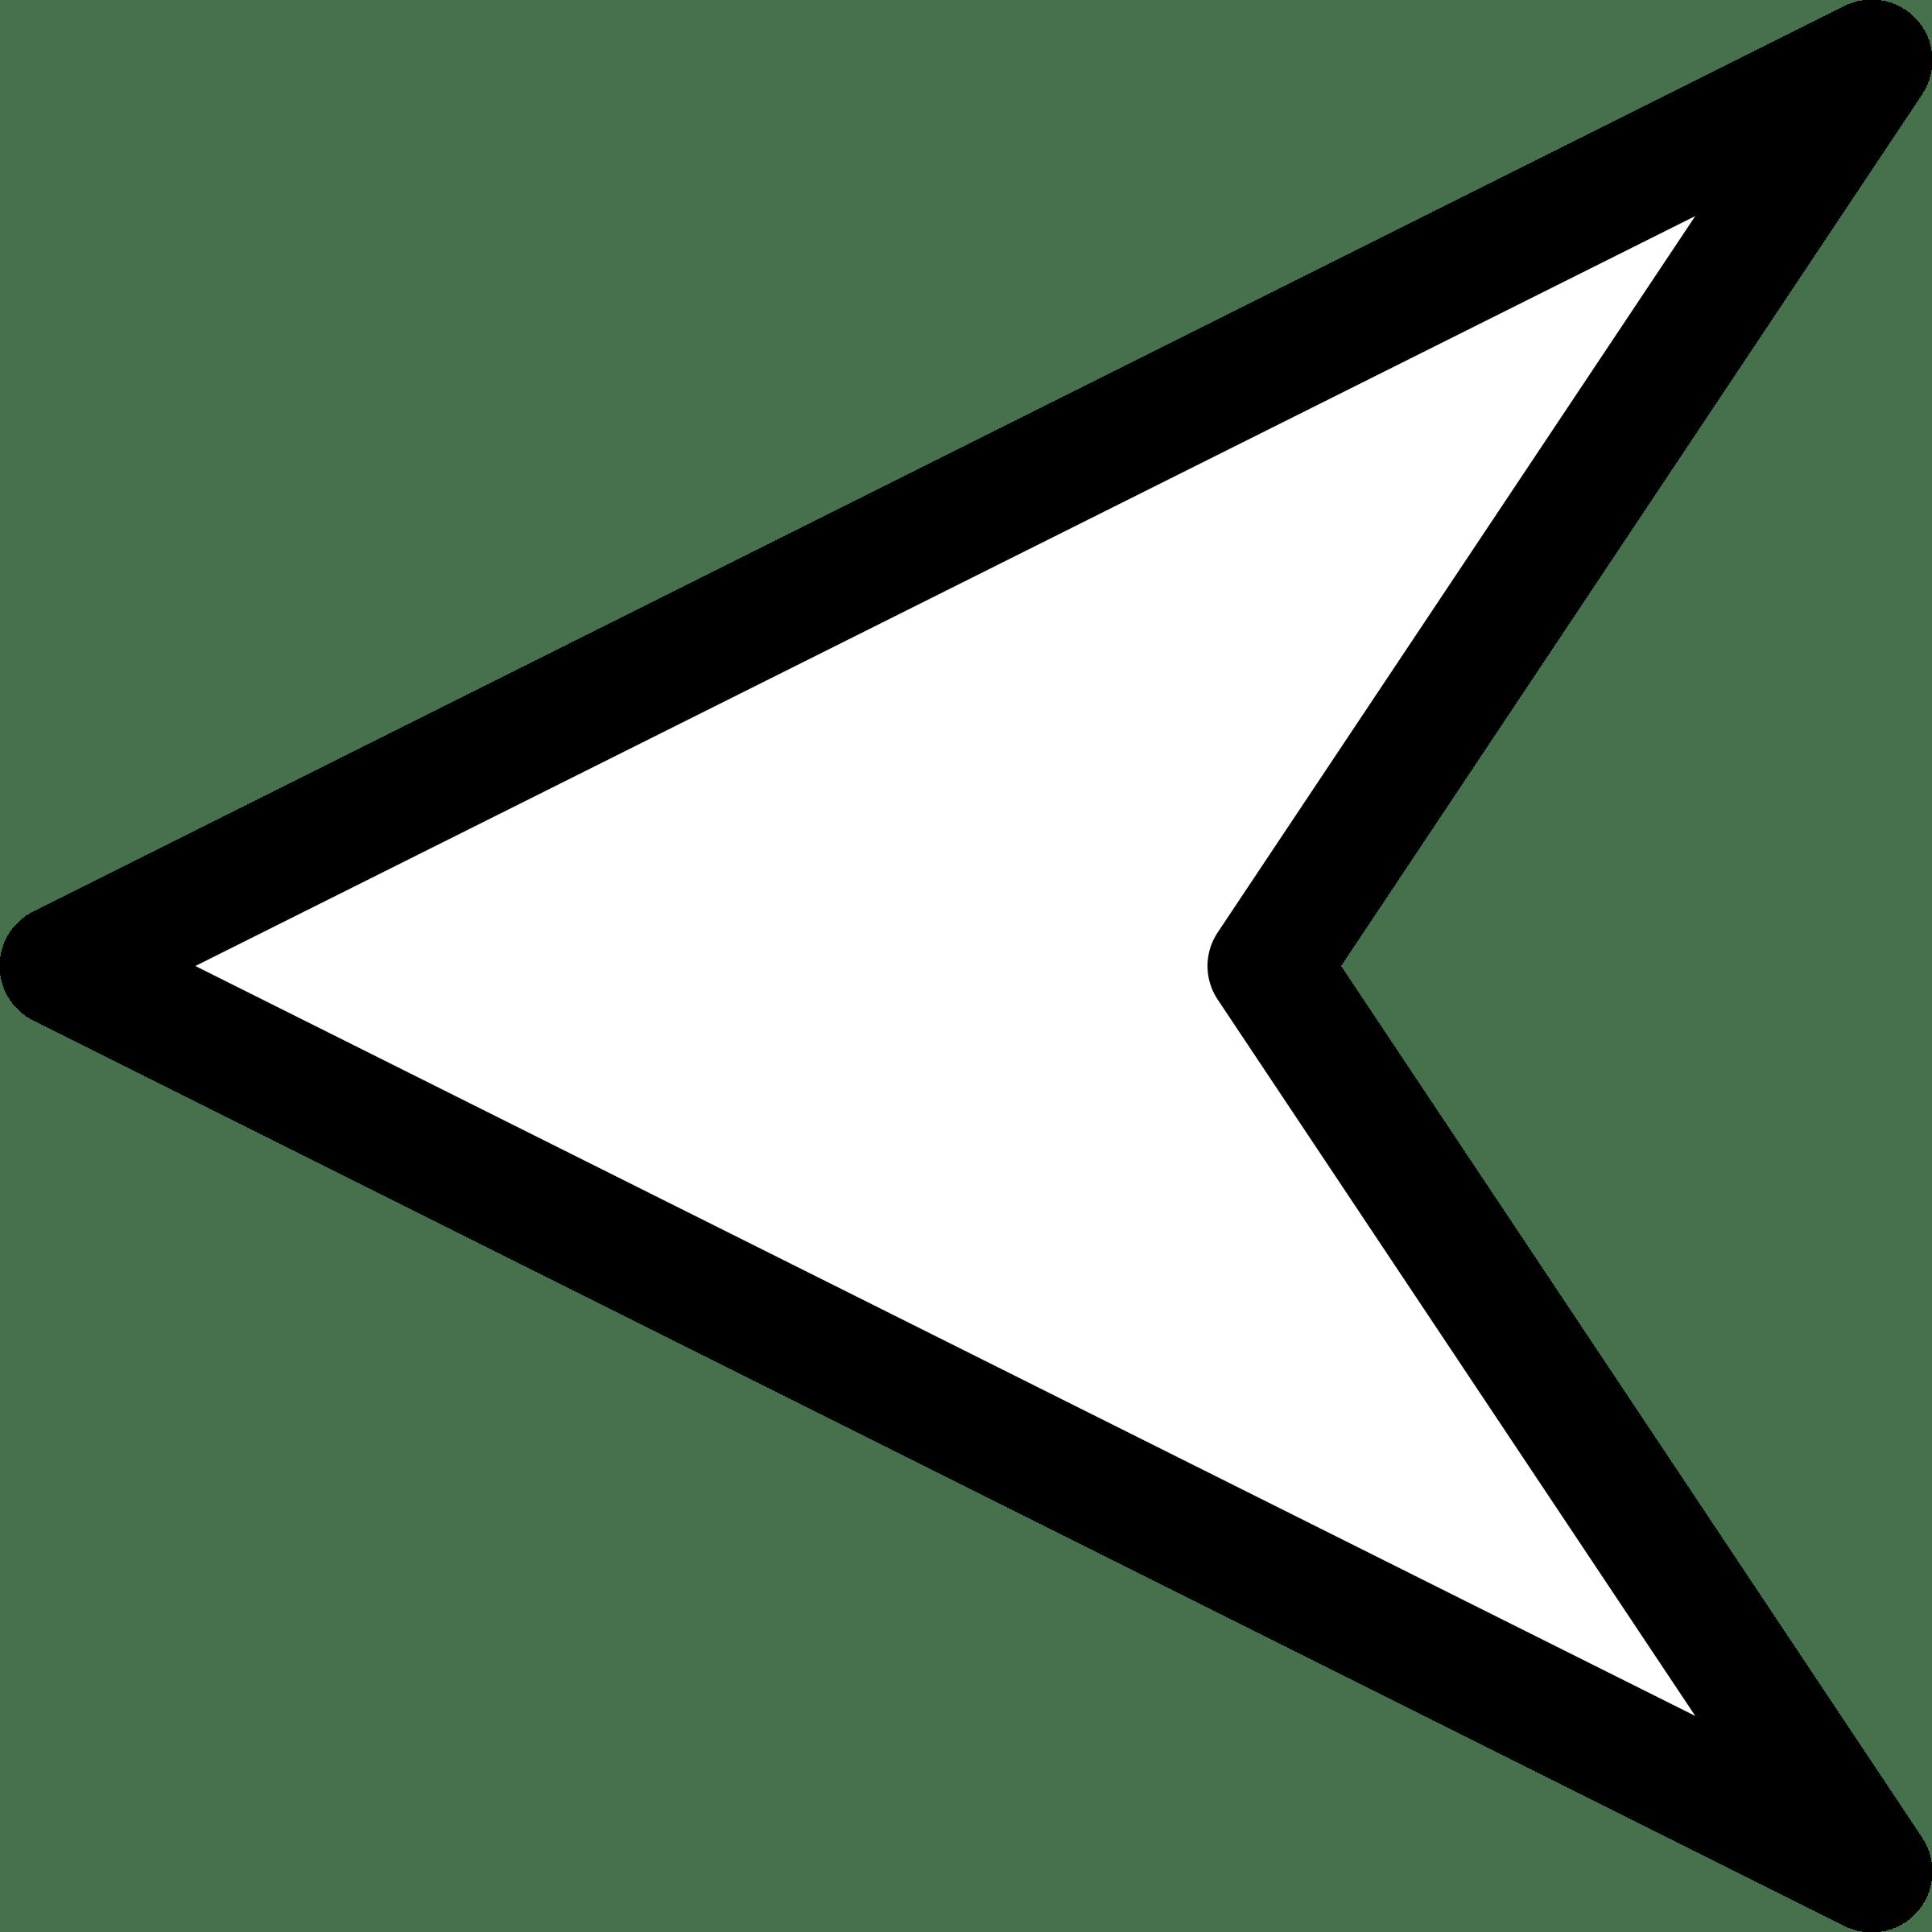 Triangle Arrow Left transparent PNG.